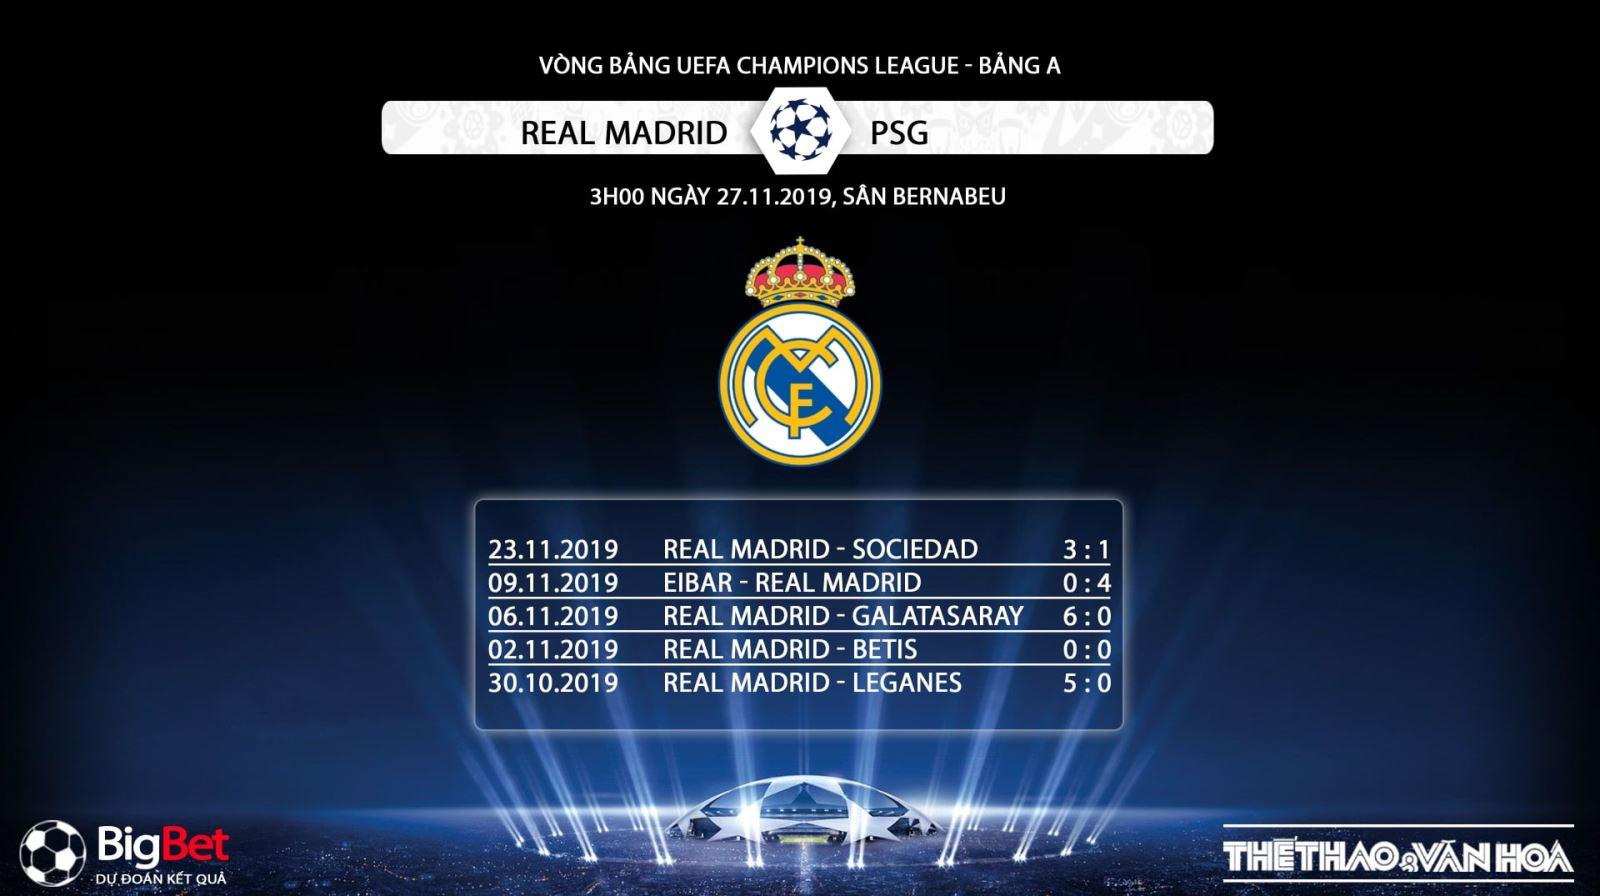 Real Madrid vs PSG, soi kèo Real Madrid vs PSG, psg, real madrid, trực tiếp bóng đá, trực tiếp Real Madrid vs PSG, K+, K+PM, K+PC